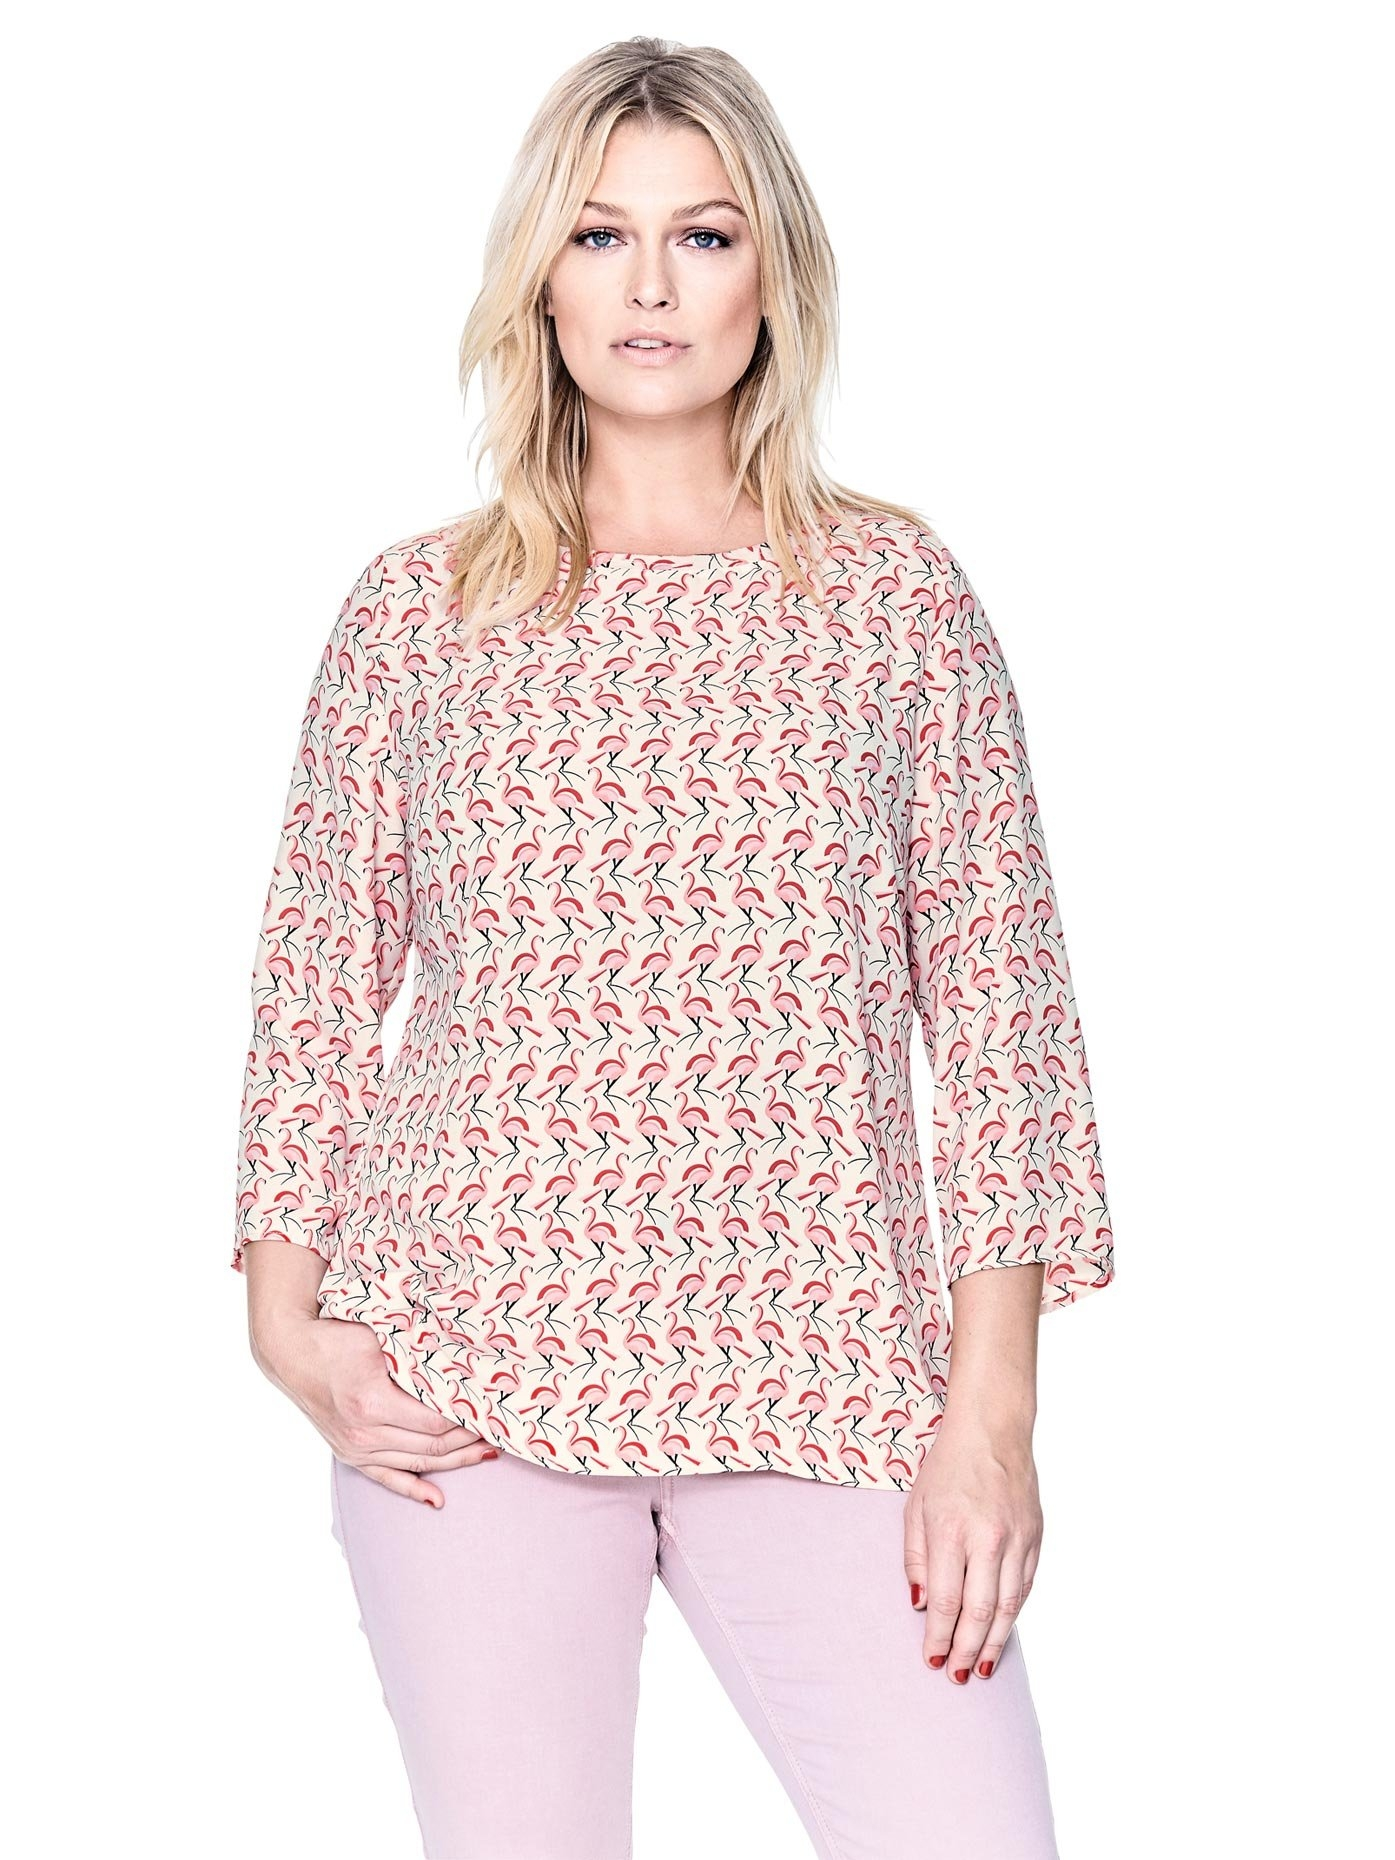 LINEA TESINI by Heine gedessineerde blouse - gratis ruilen op otto.nl